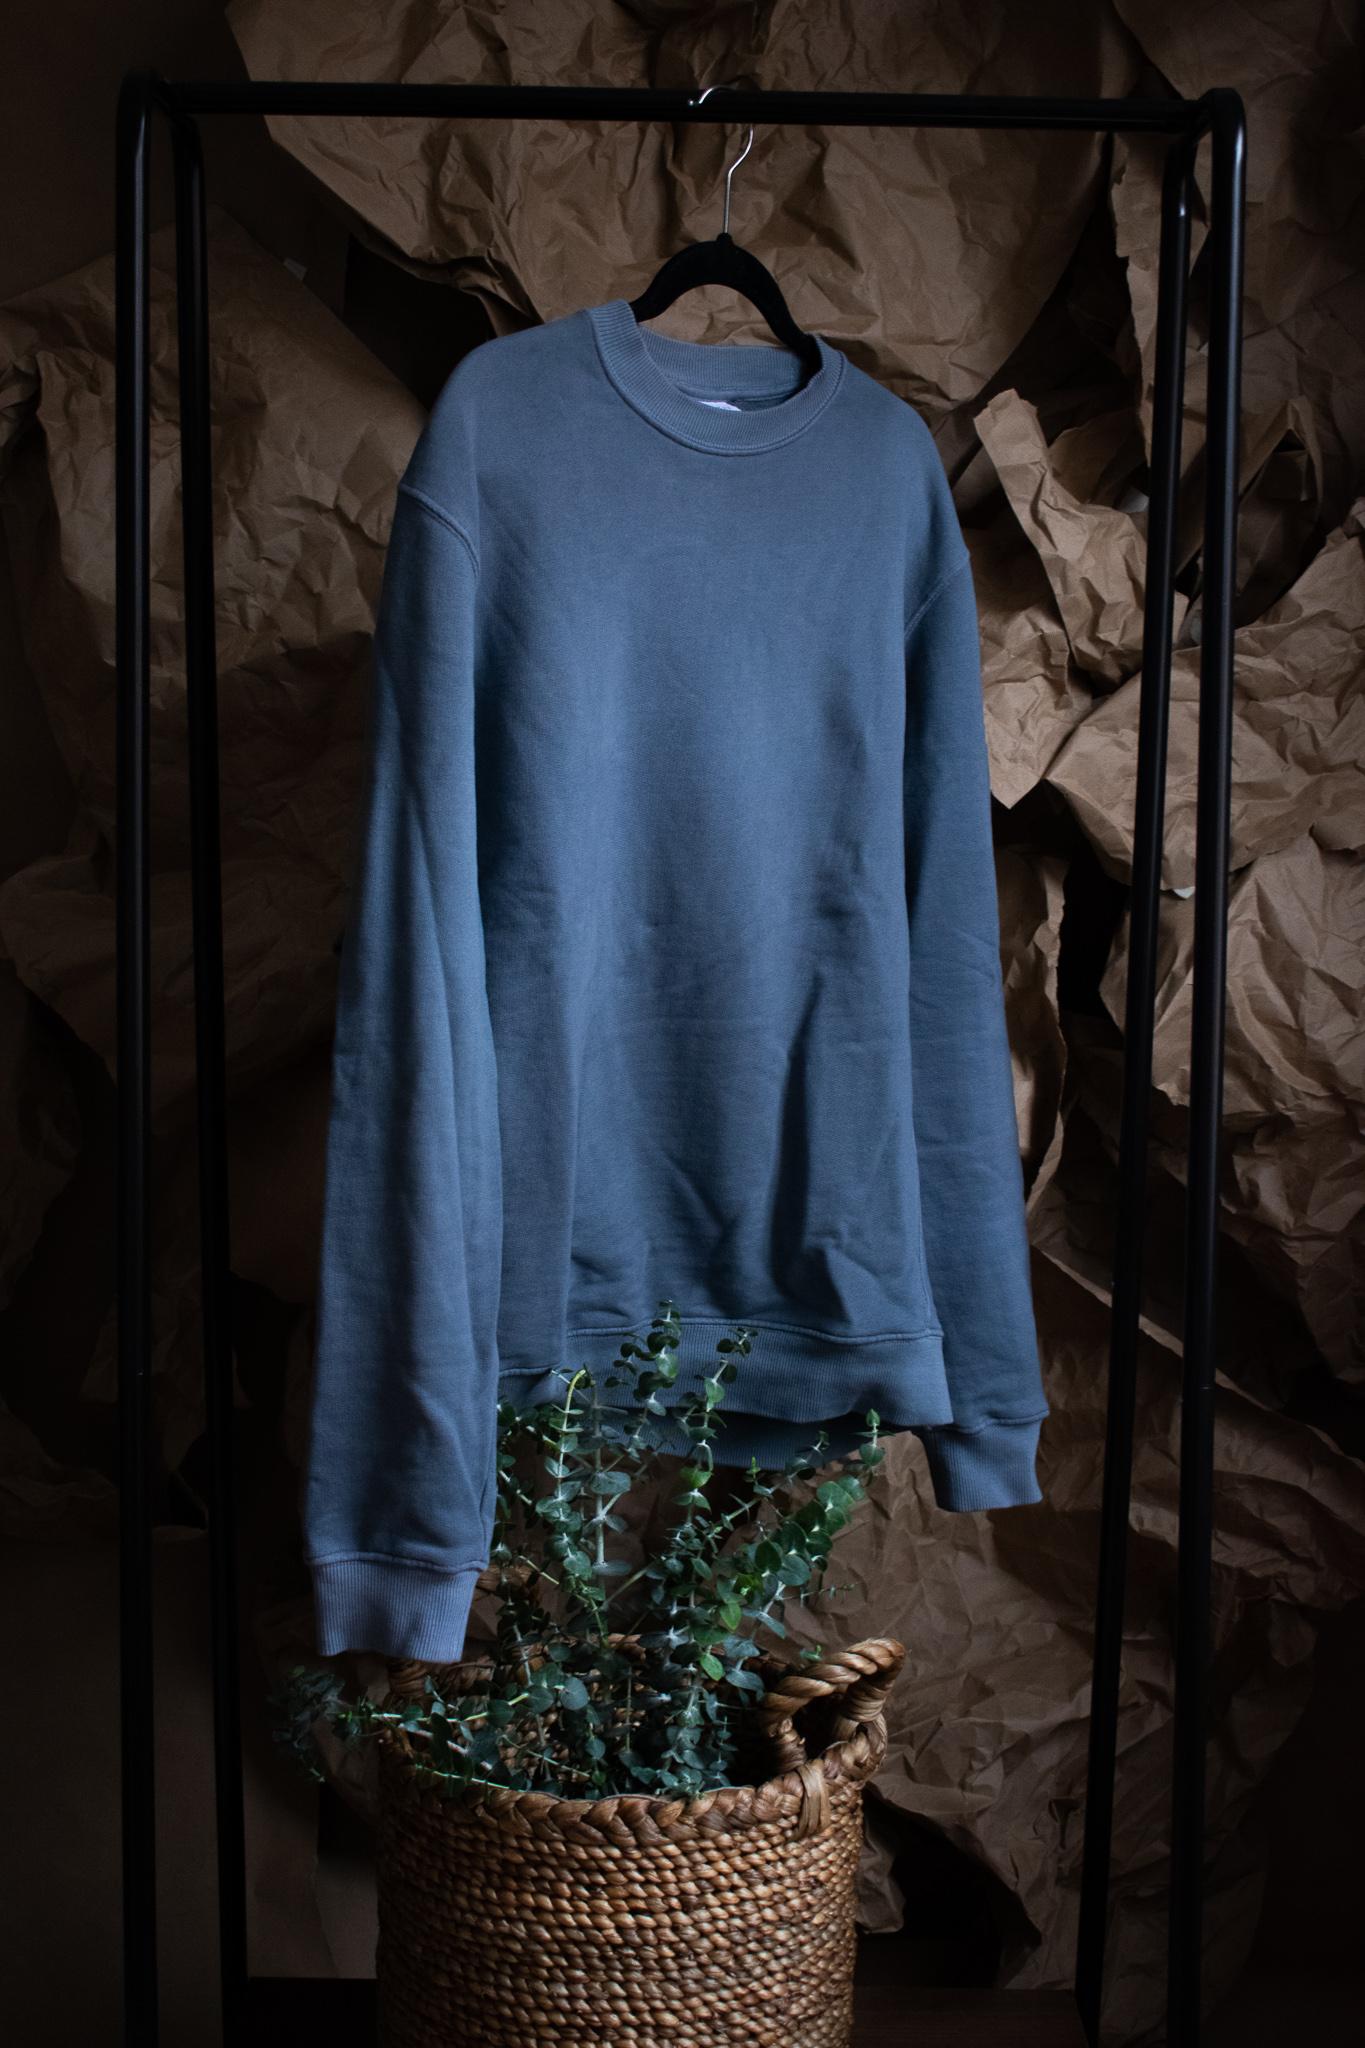 centrefront sweatshirt. <1 year. $70. good as new.